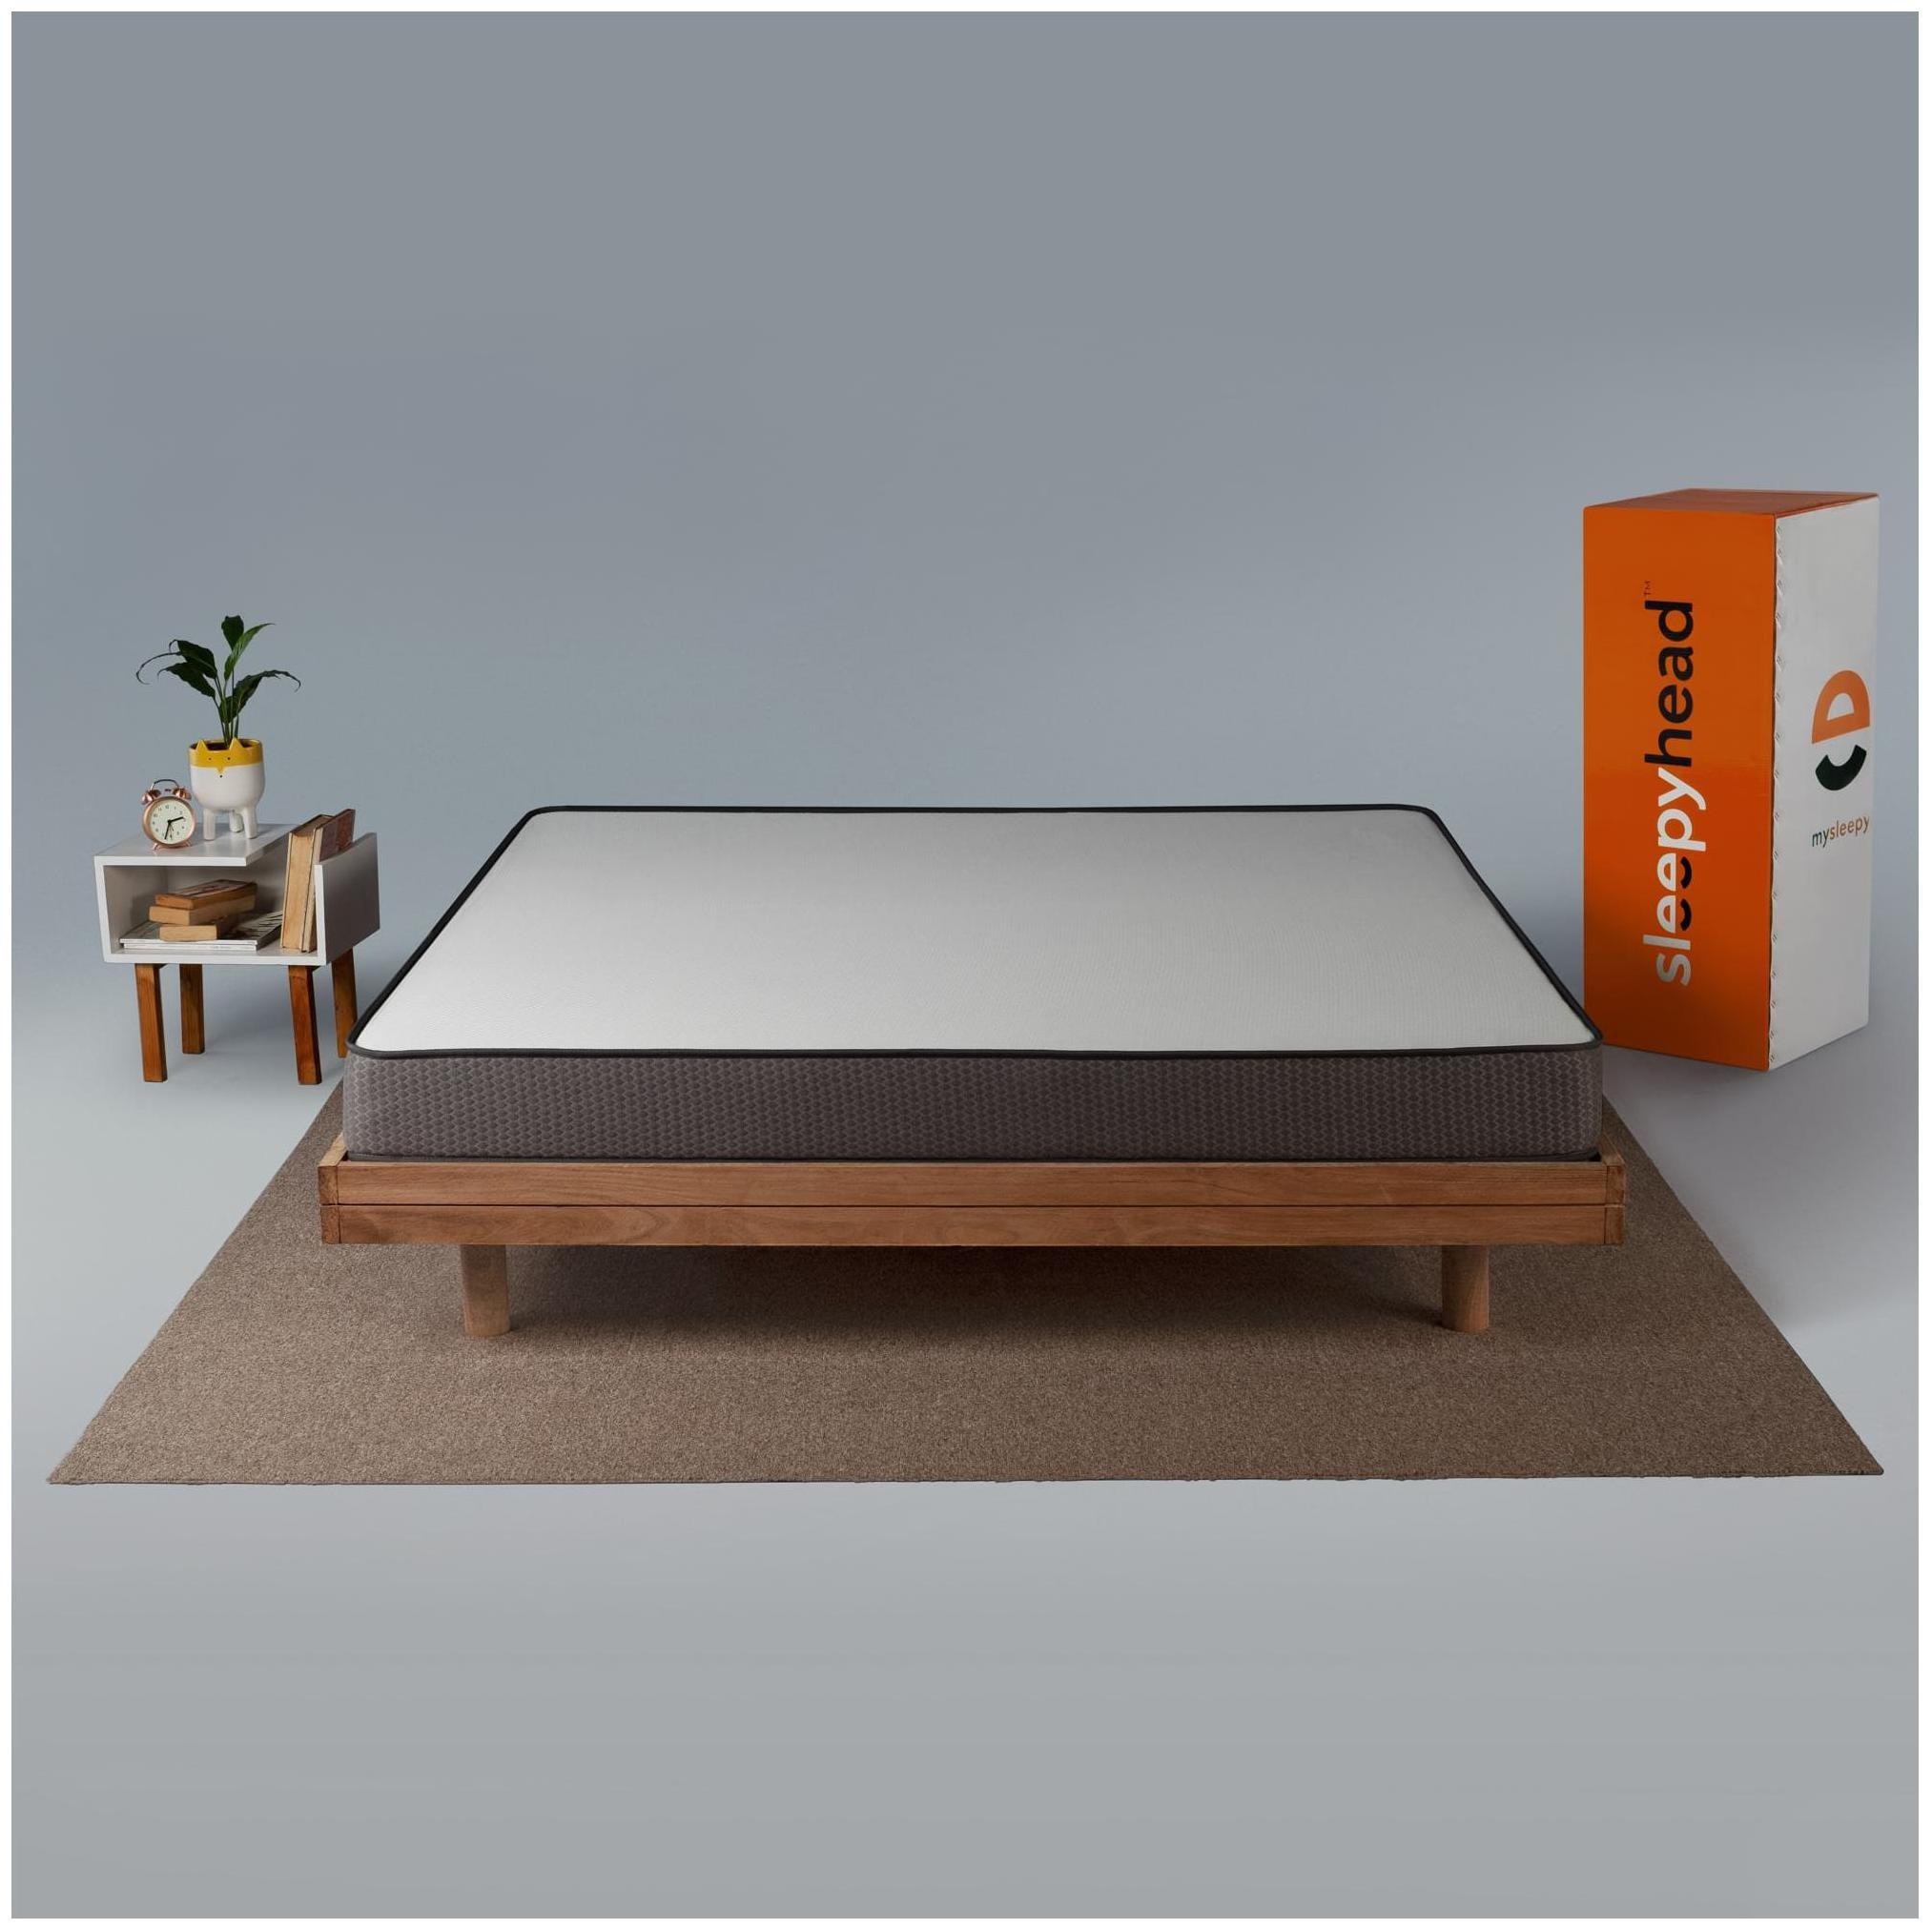 Sleepyhead Flip Dual Sided High Density Foam Mattress with Firm   Soft Sides;78x60x5 inch Queen Size  by Sleepyhead Home Decor